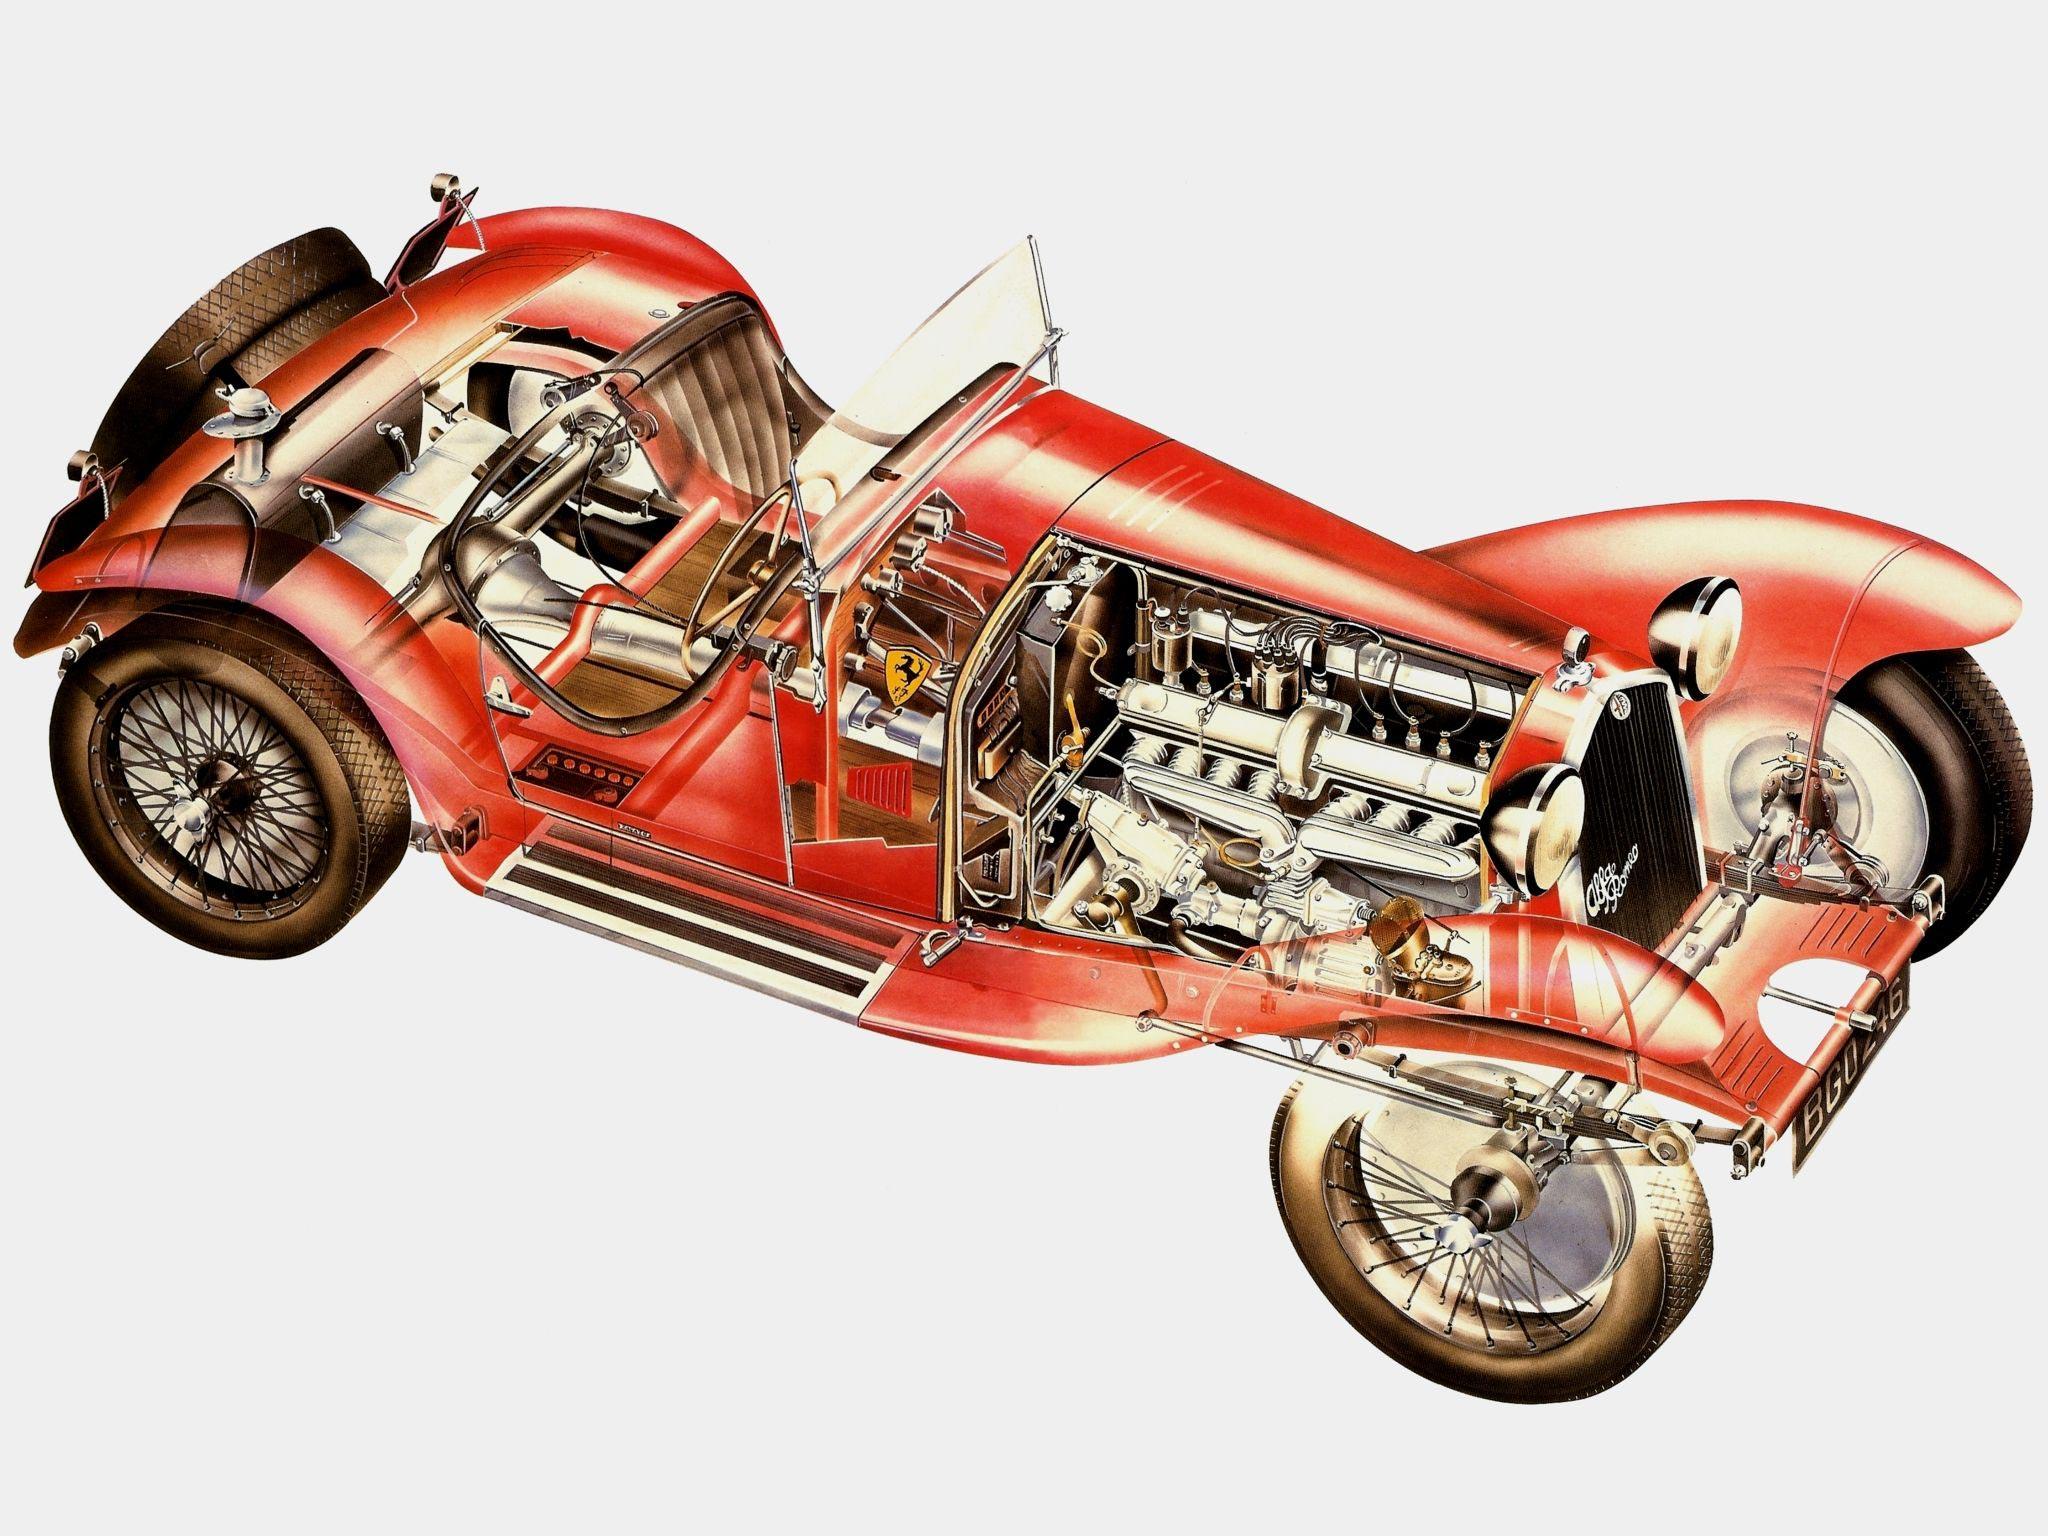 Alfa Romeo 8C 2300 Spider Corsa cutaway drawing